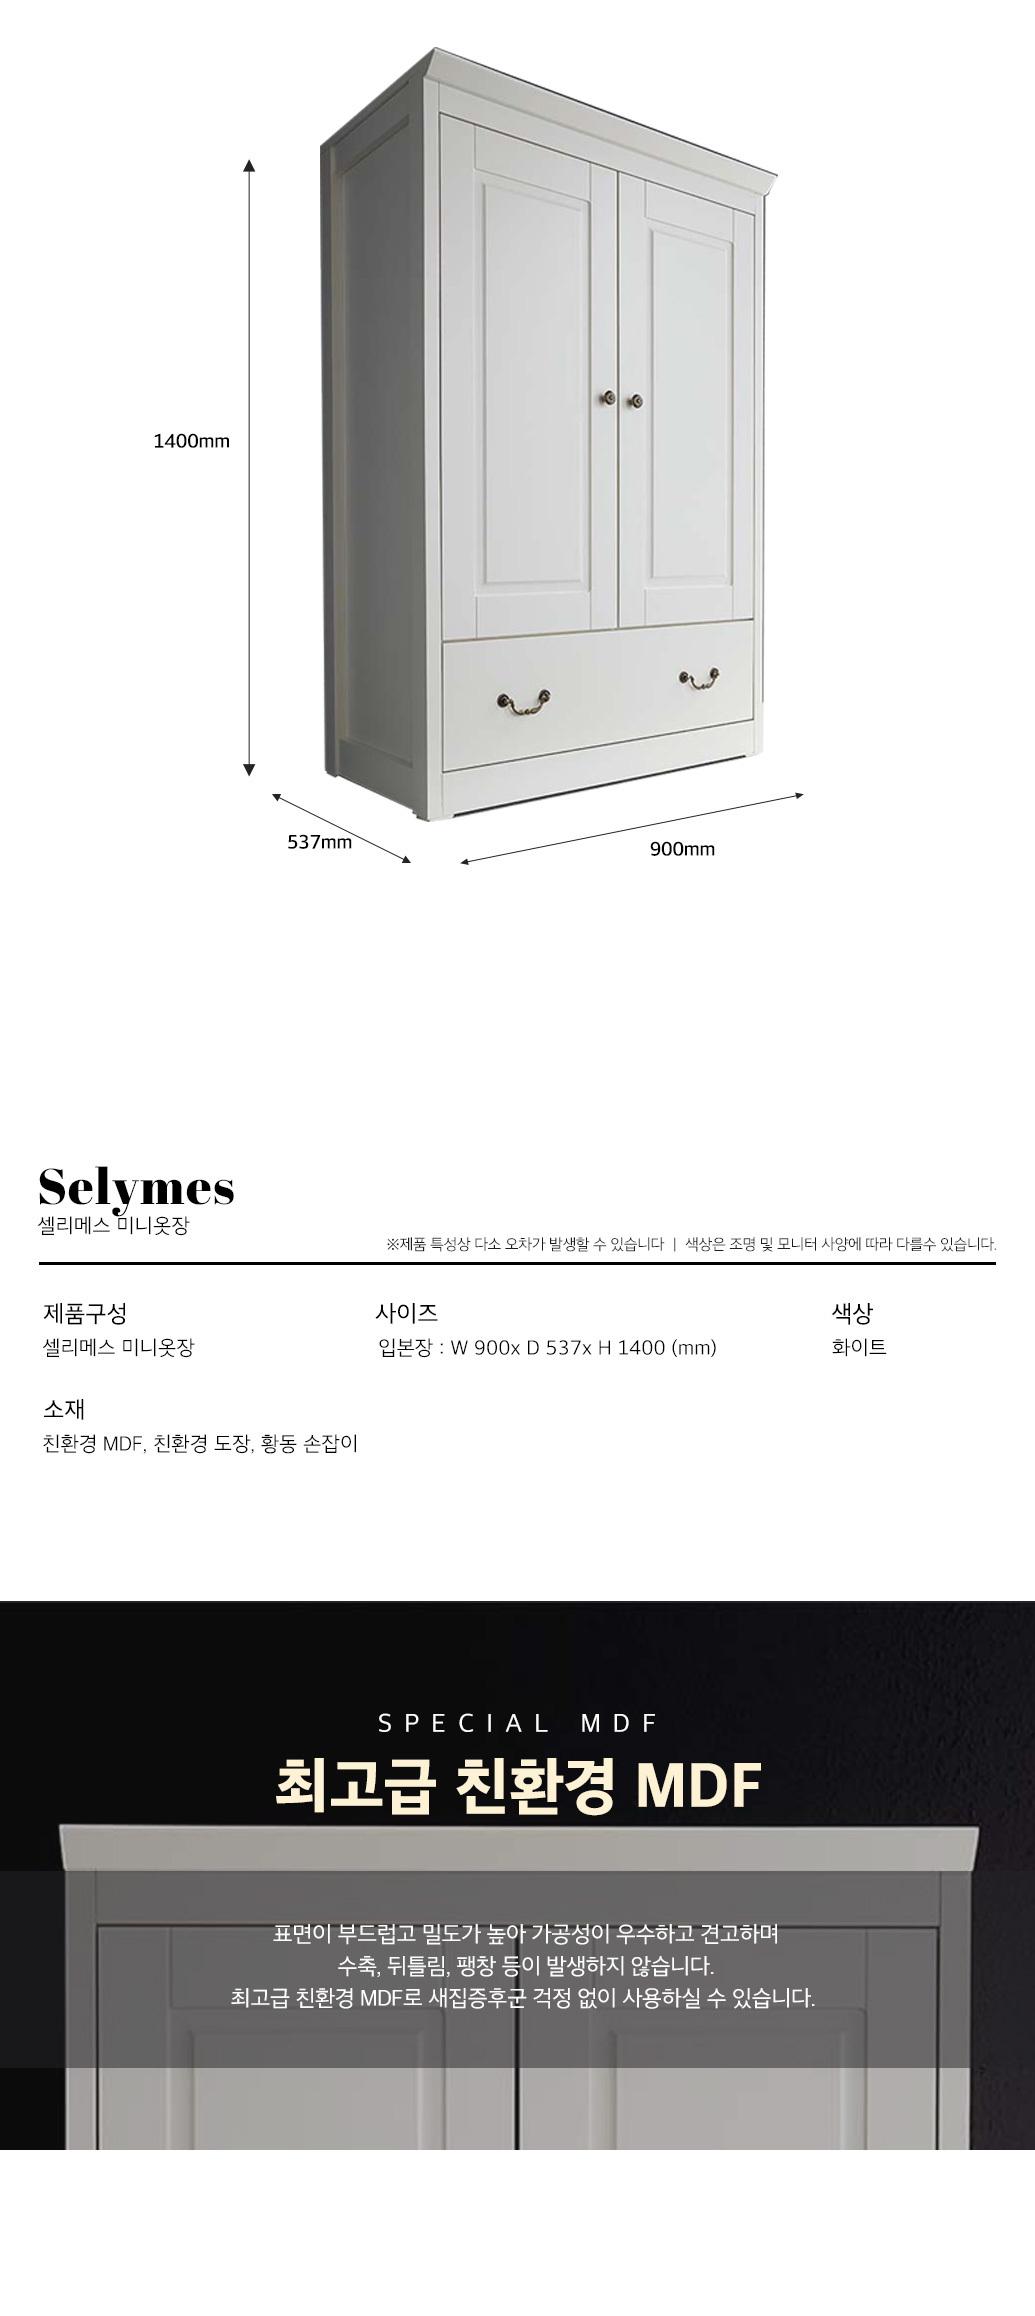 selymes_mini_02.jpg